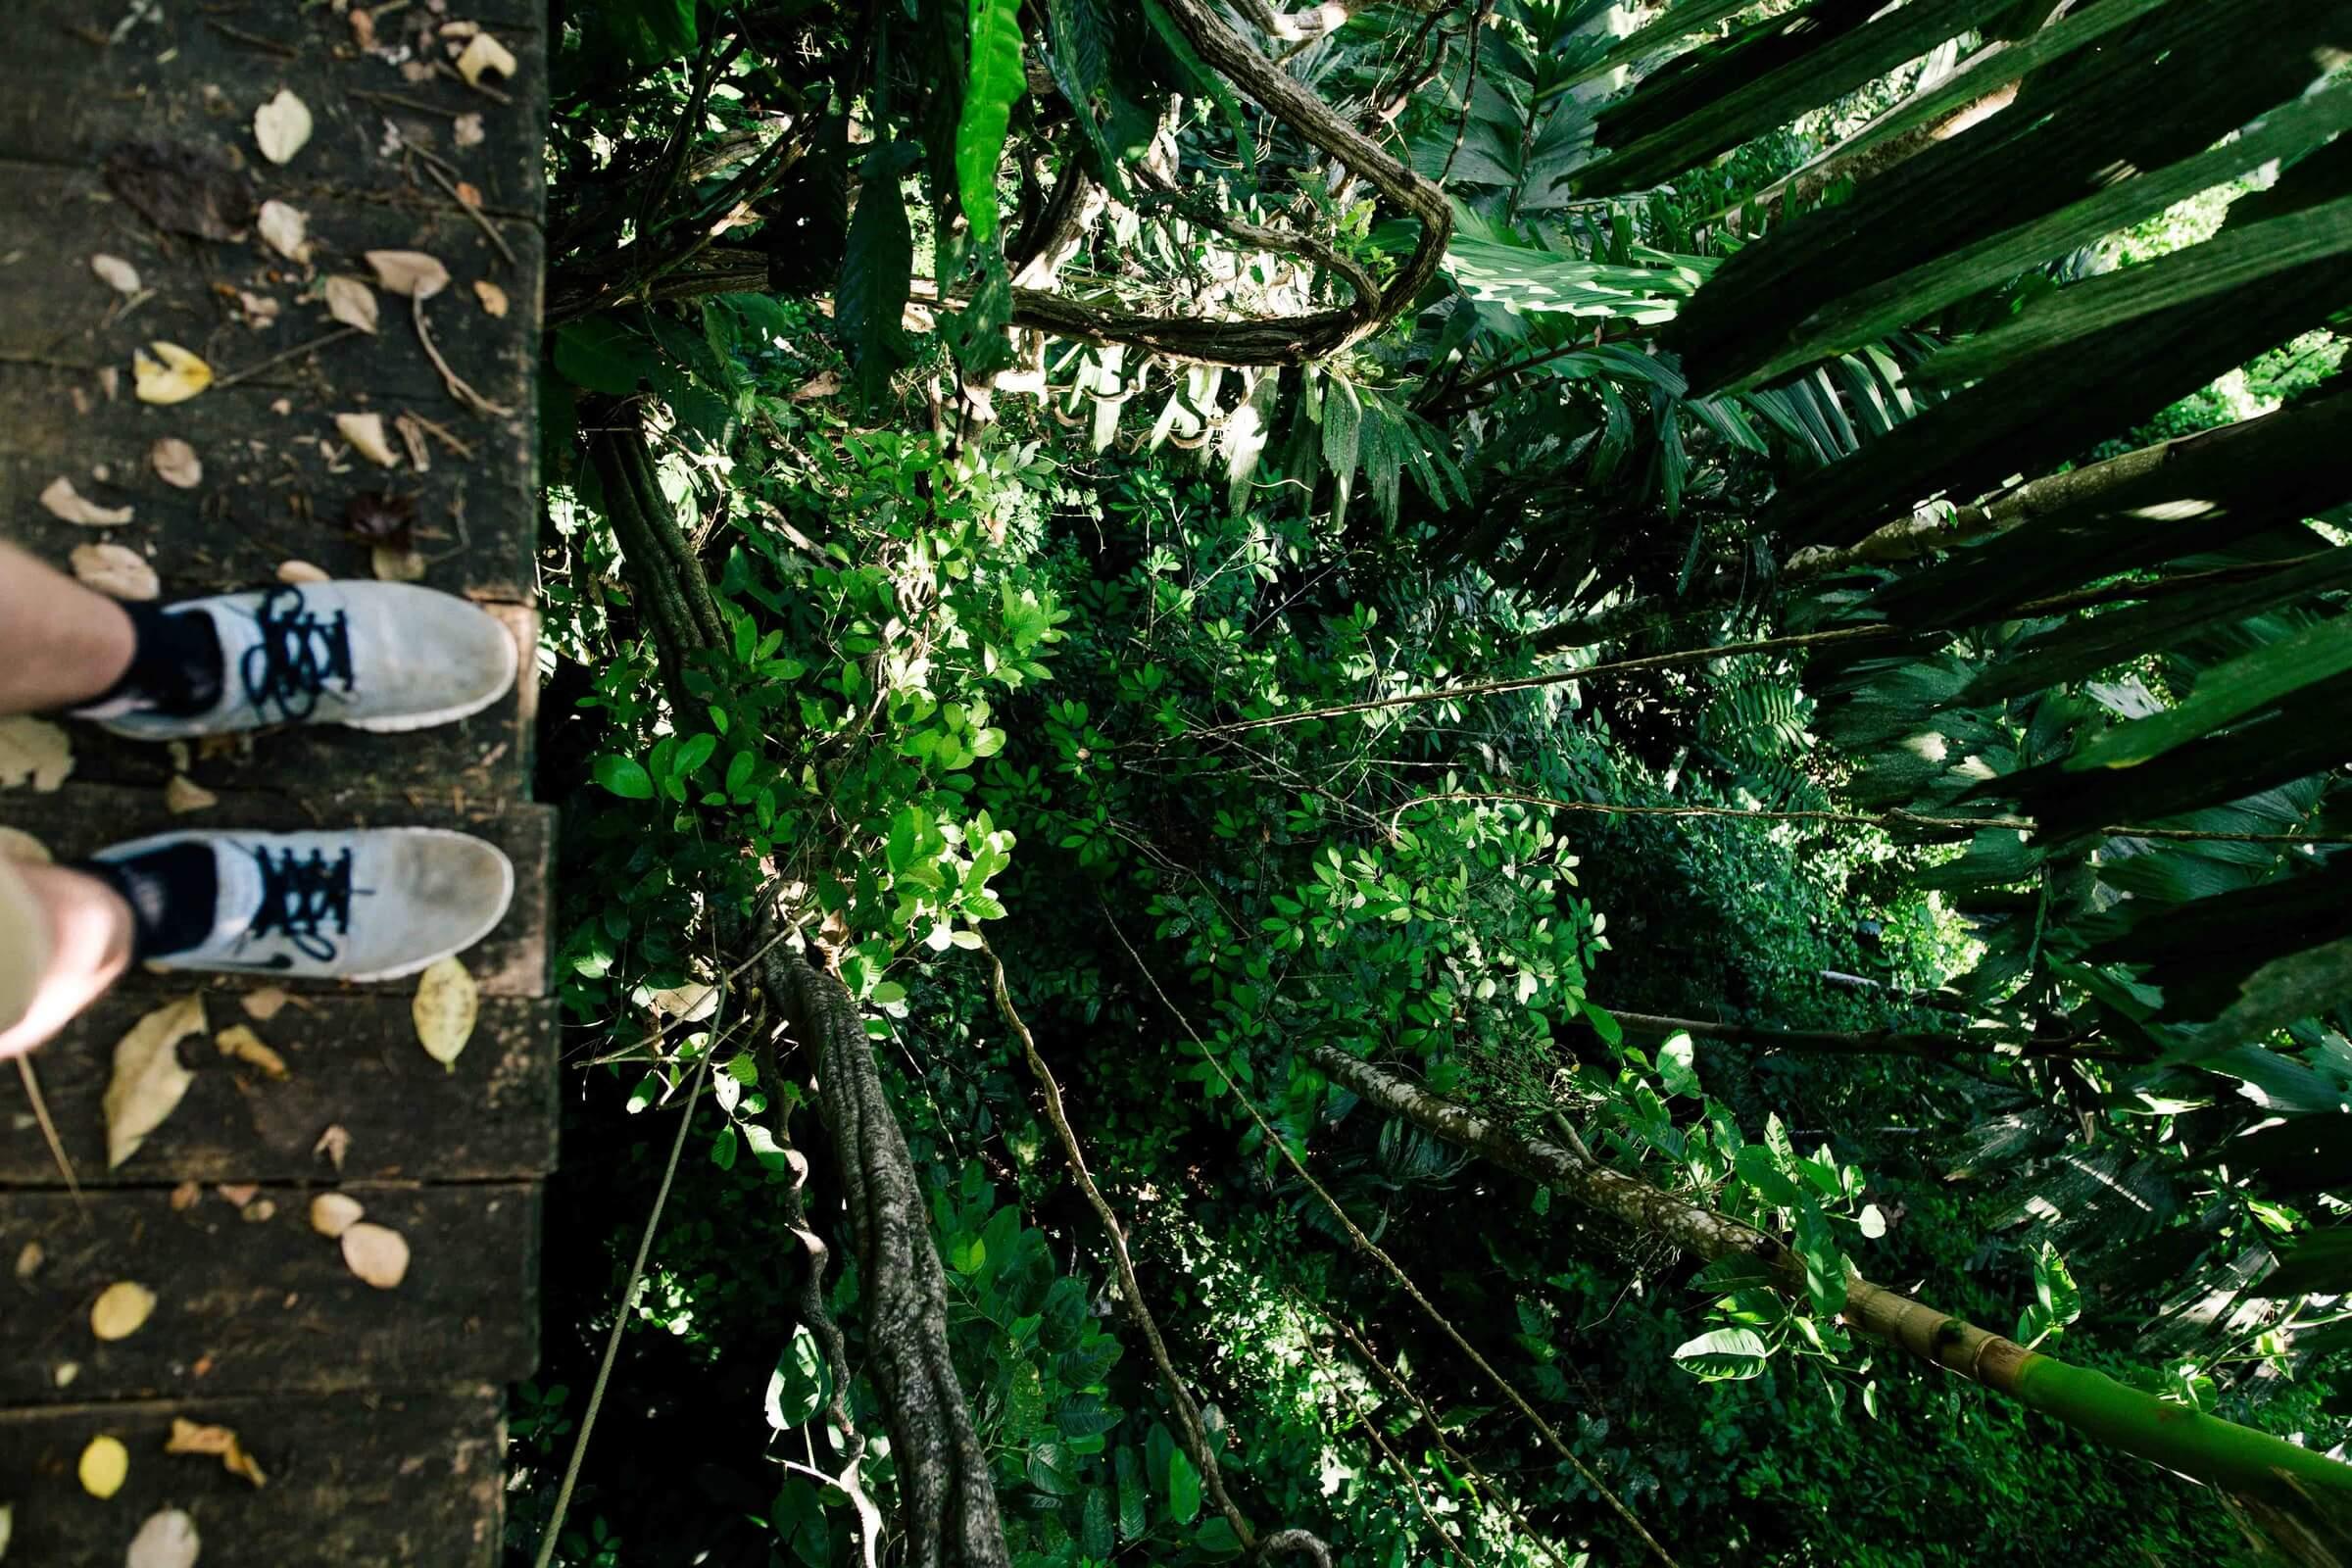 Feet standing on a boardwalk over lush, green jungle view